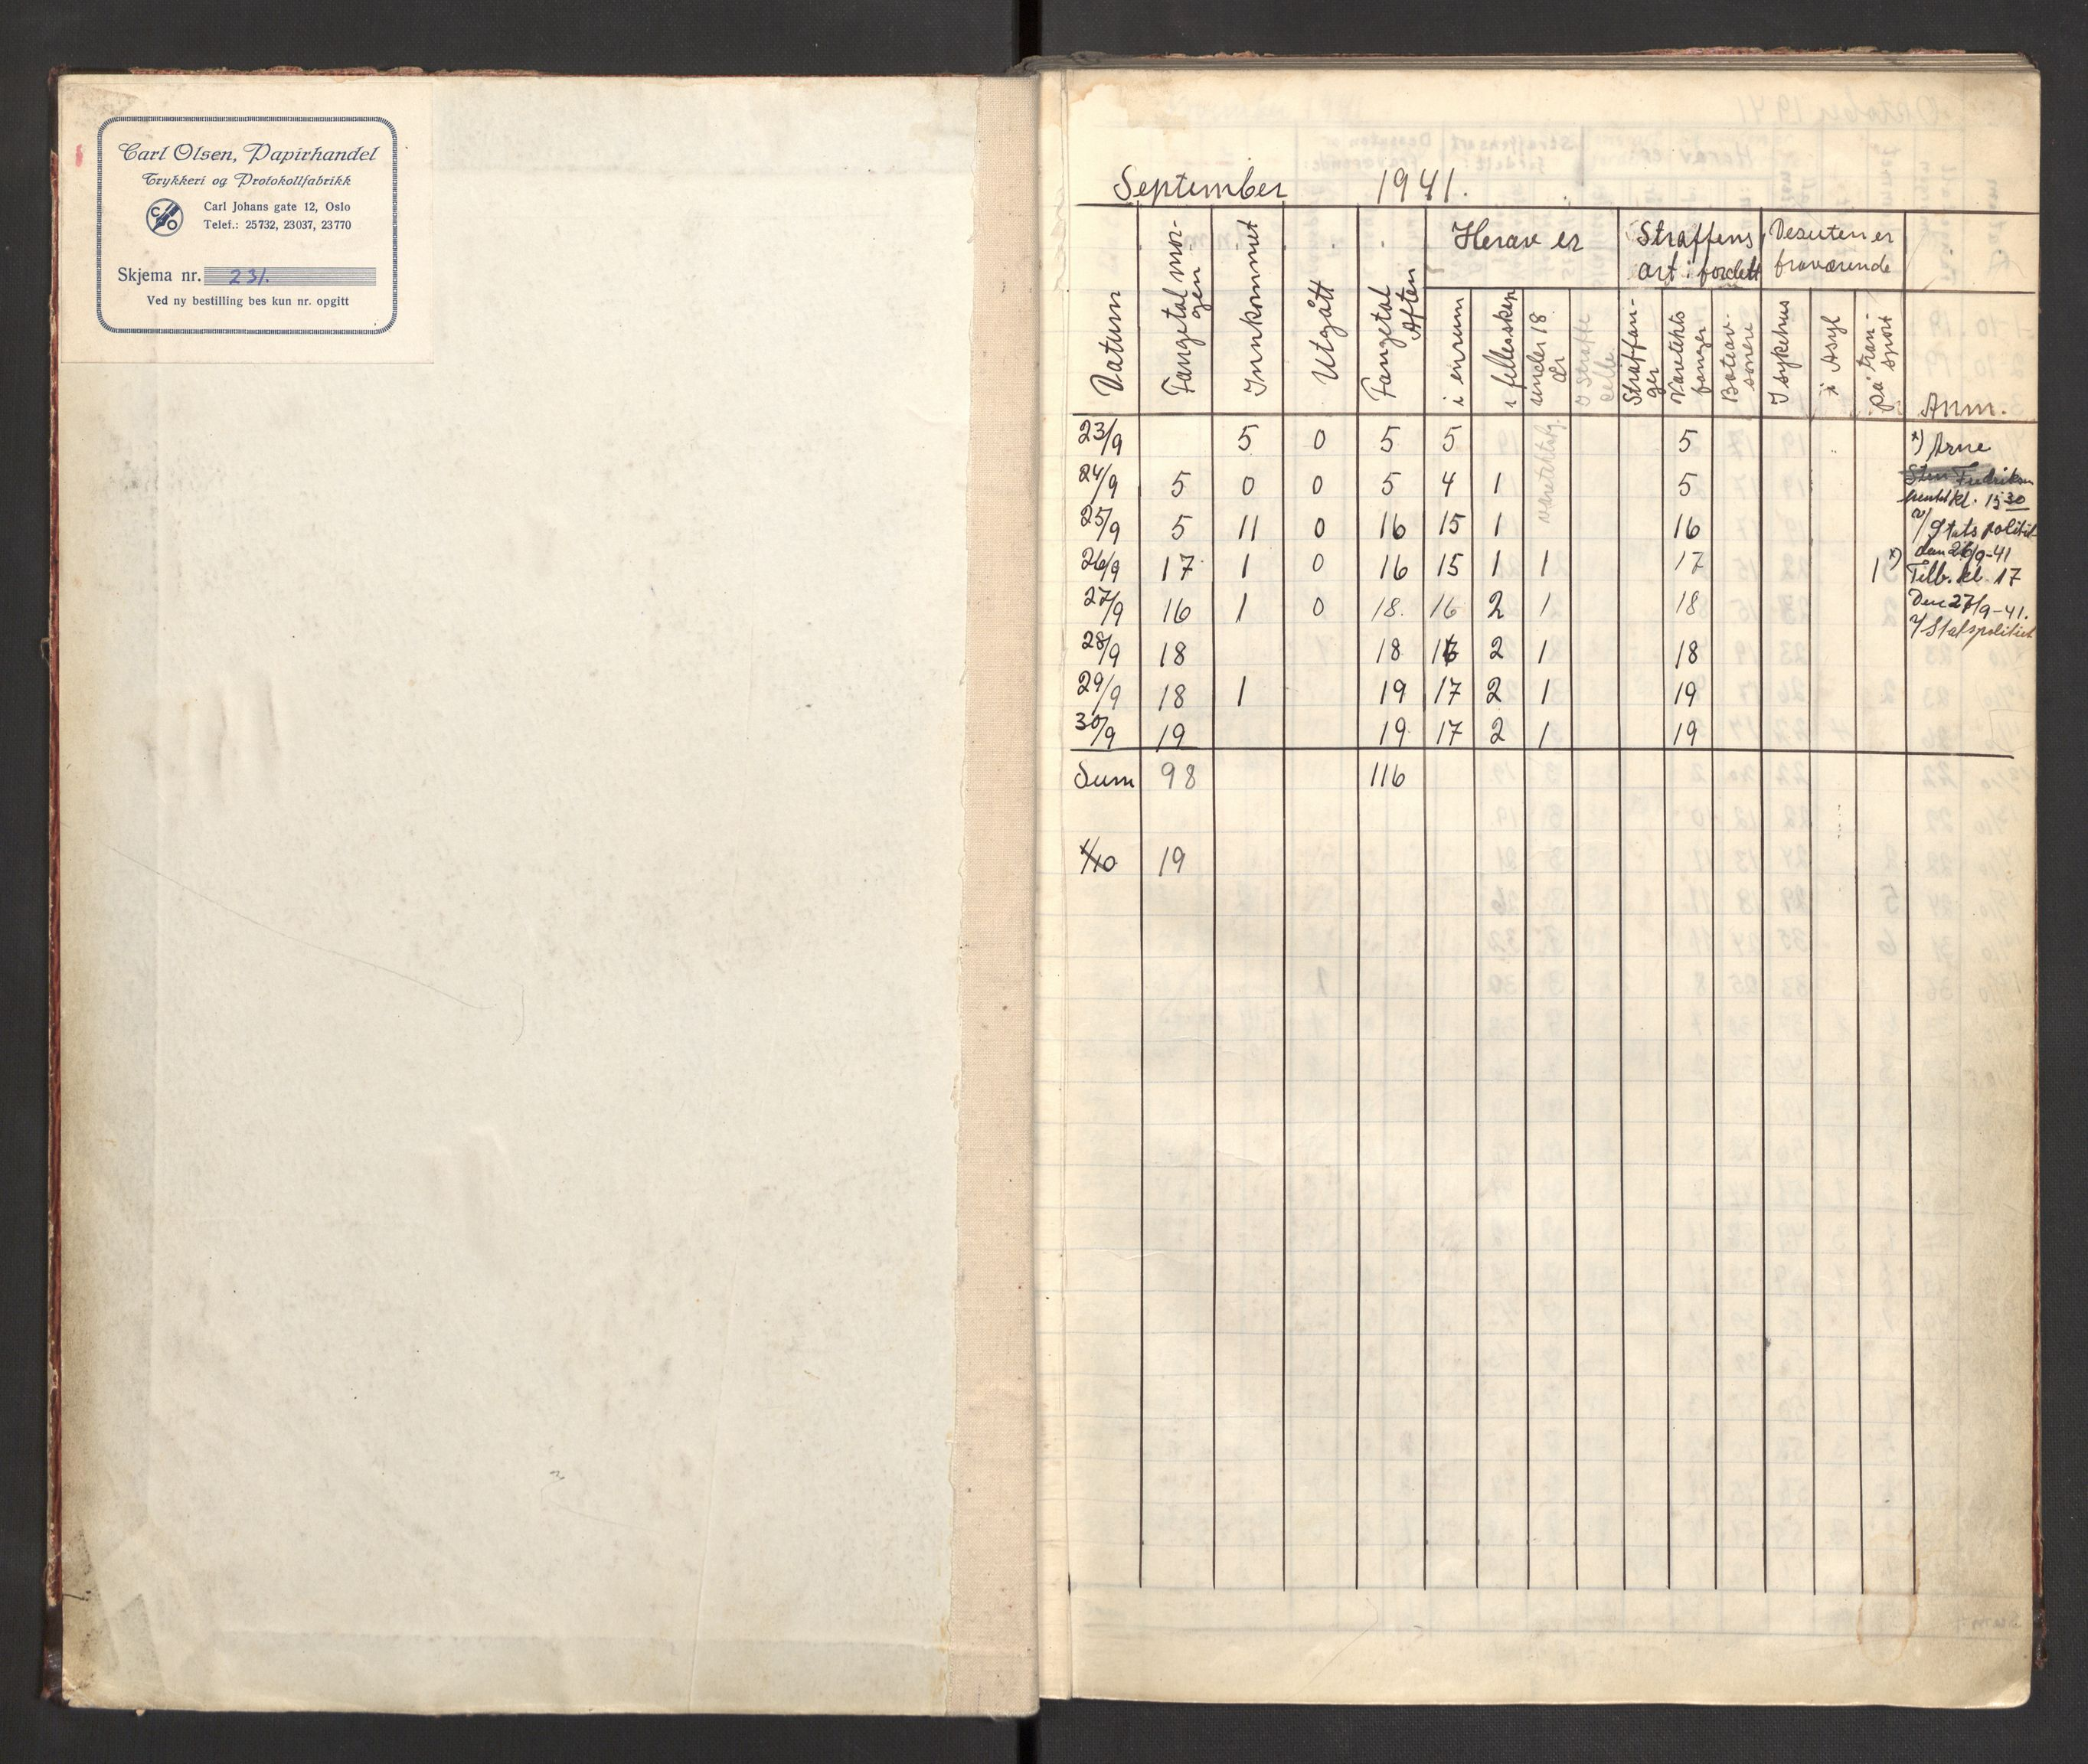 RA, Statspolitiet - Hovedkontoret / Osloavdelingen, C/Cl/L0016: Fangetallsprotokoll (statistikk), 1941-1945